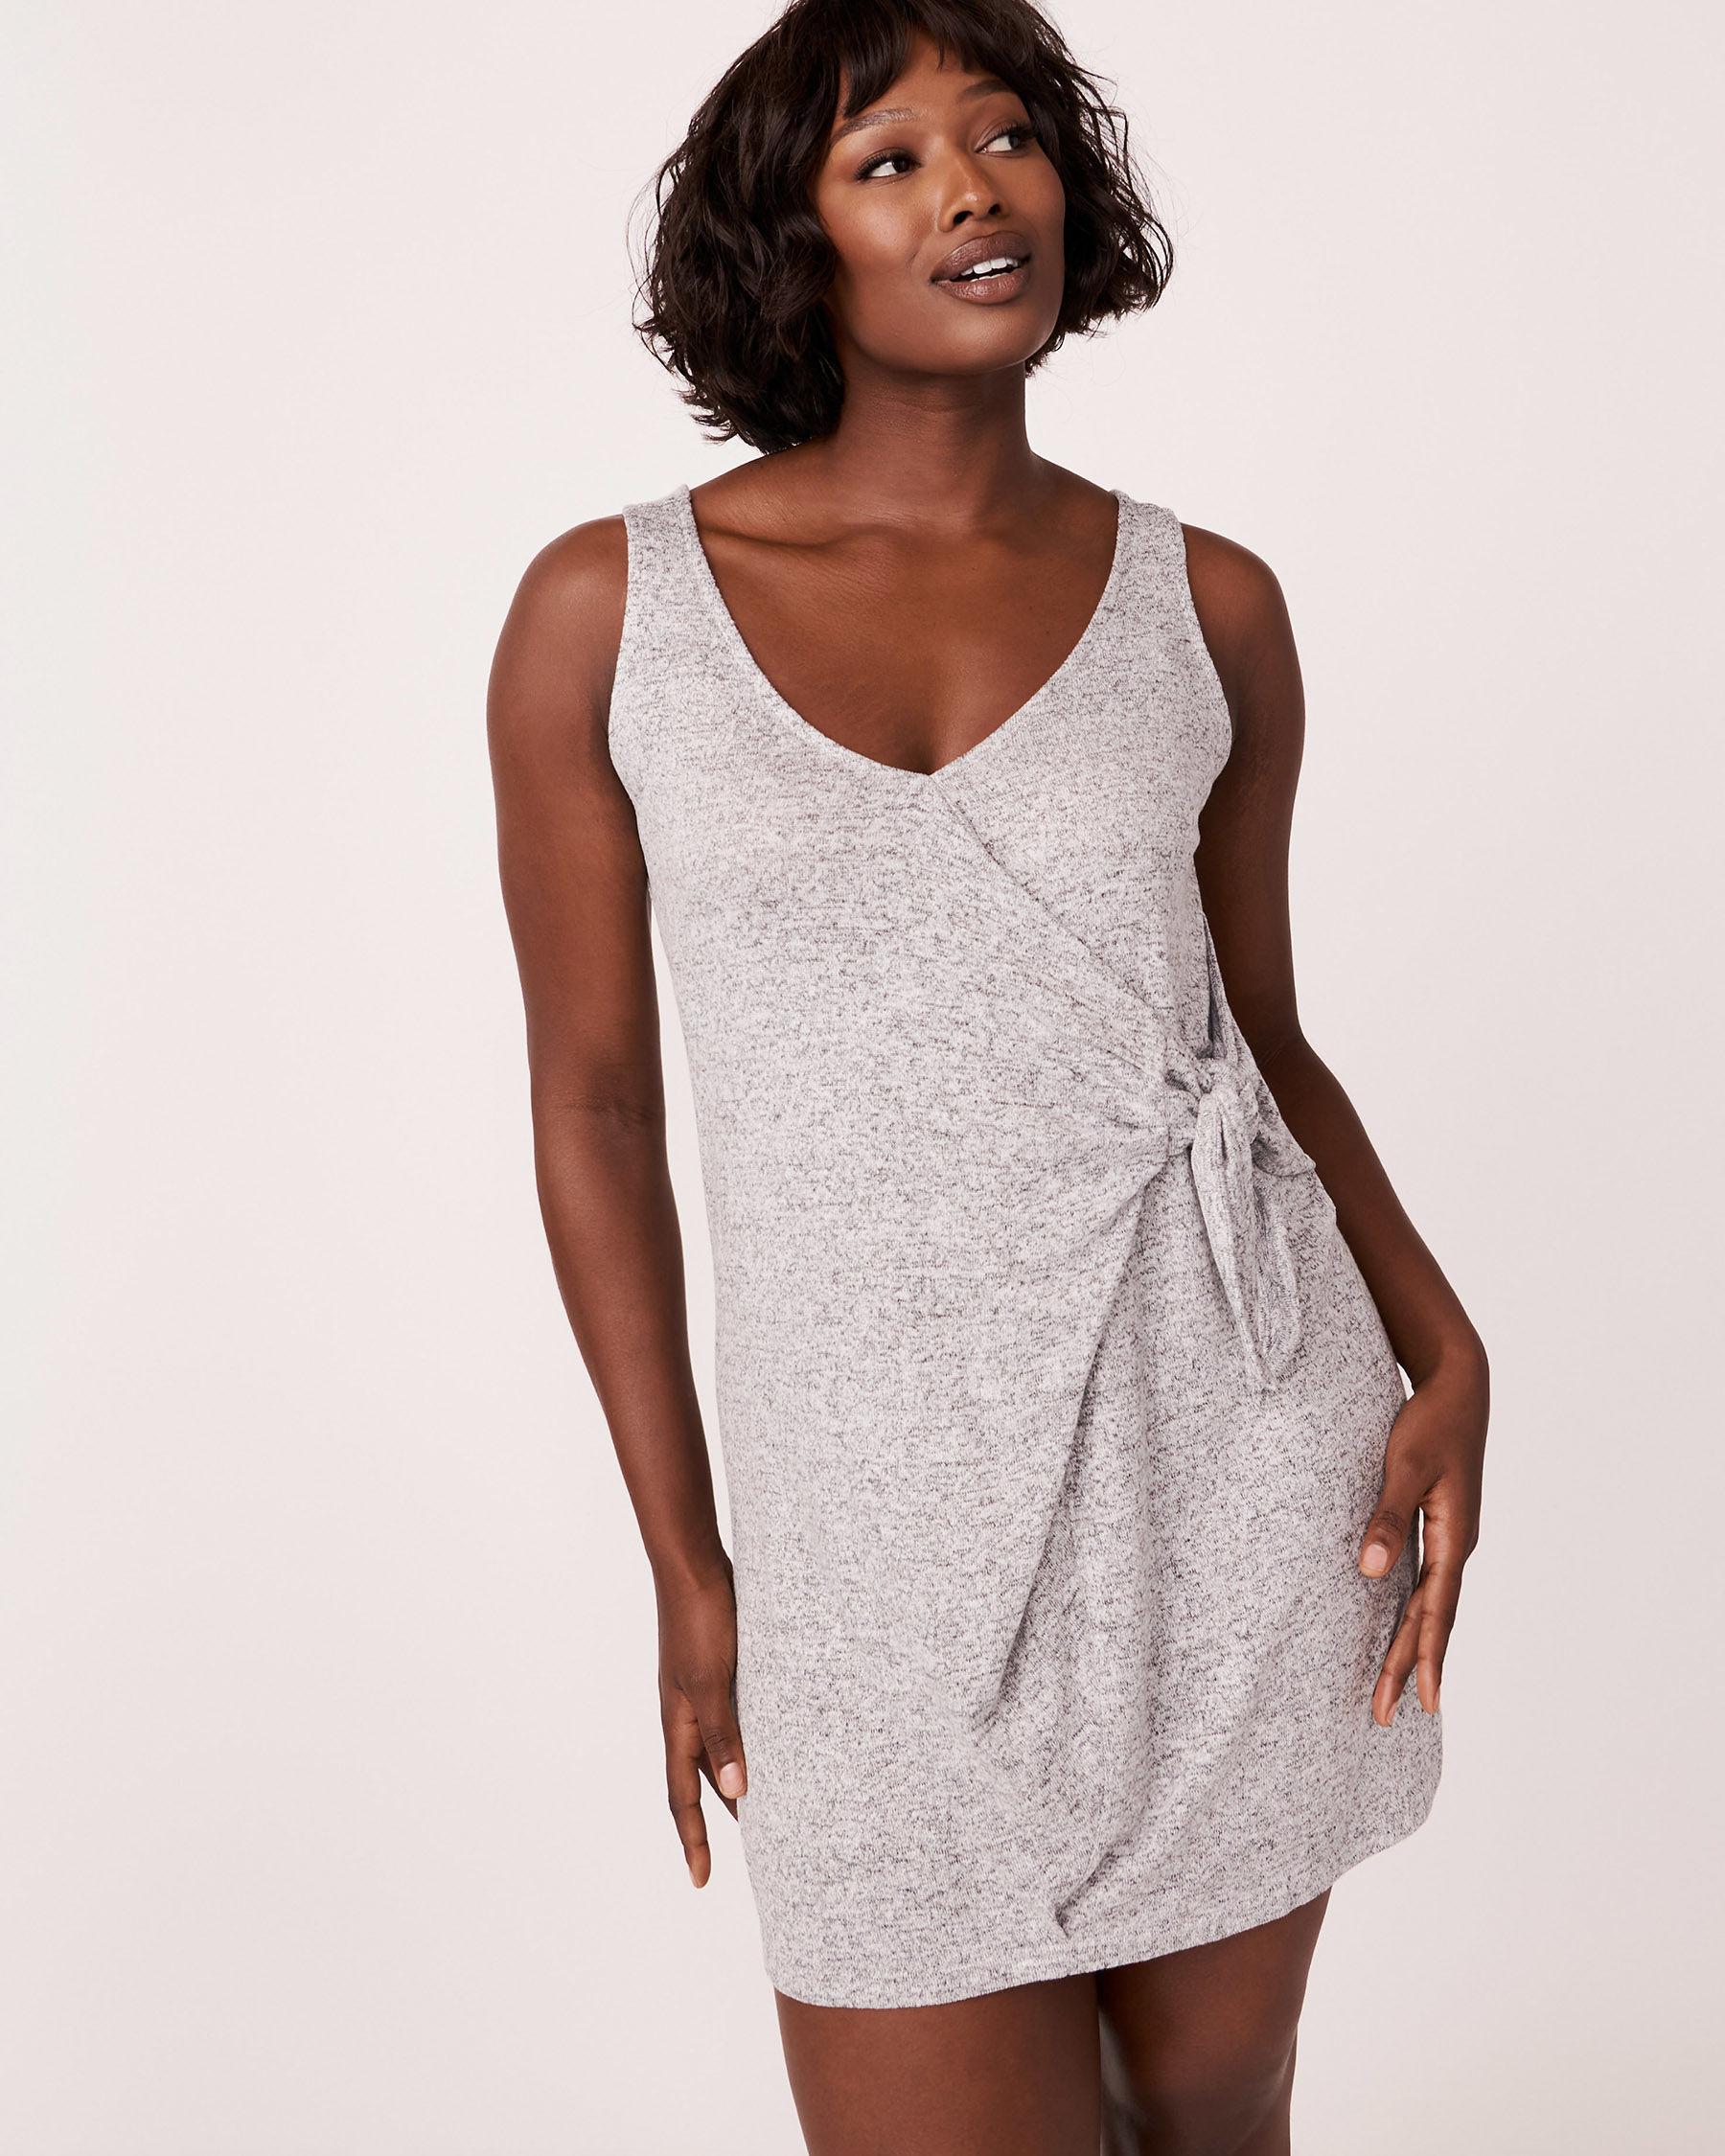 LA VIE EN ROSE Knotted V-neckline Sleeveless Dress Grey 766-474-0-11 - View4